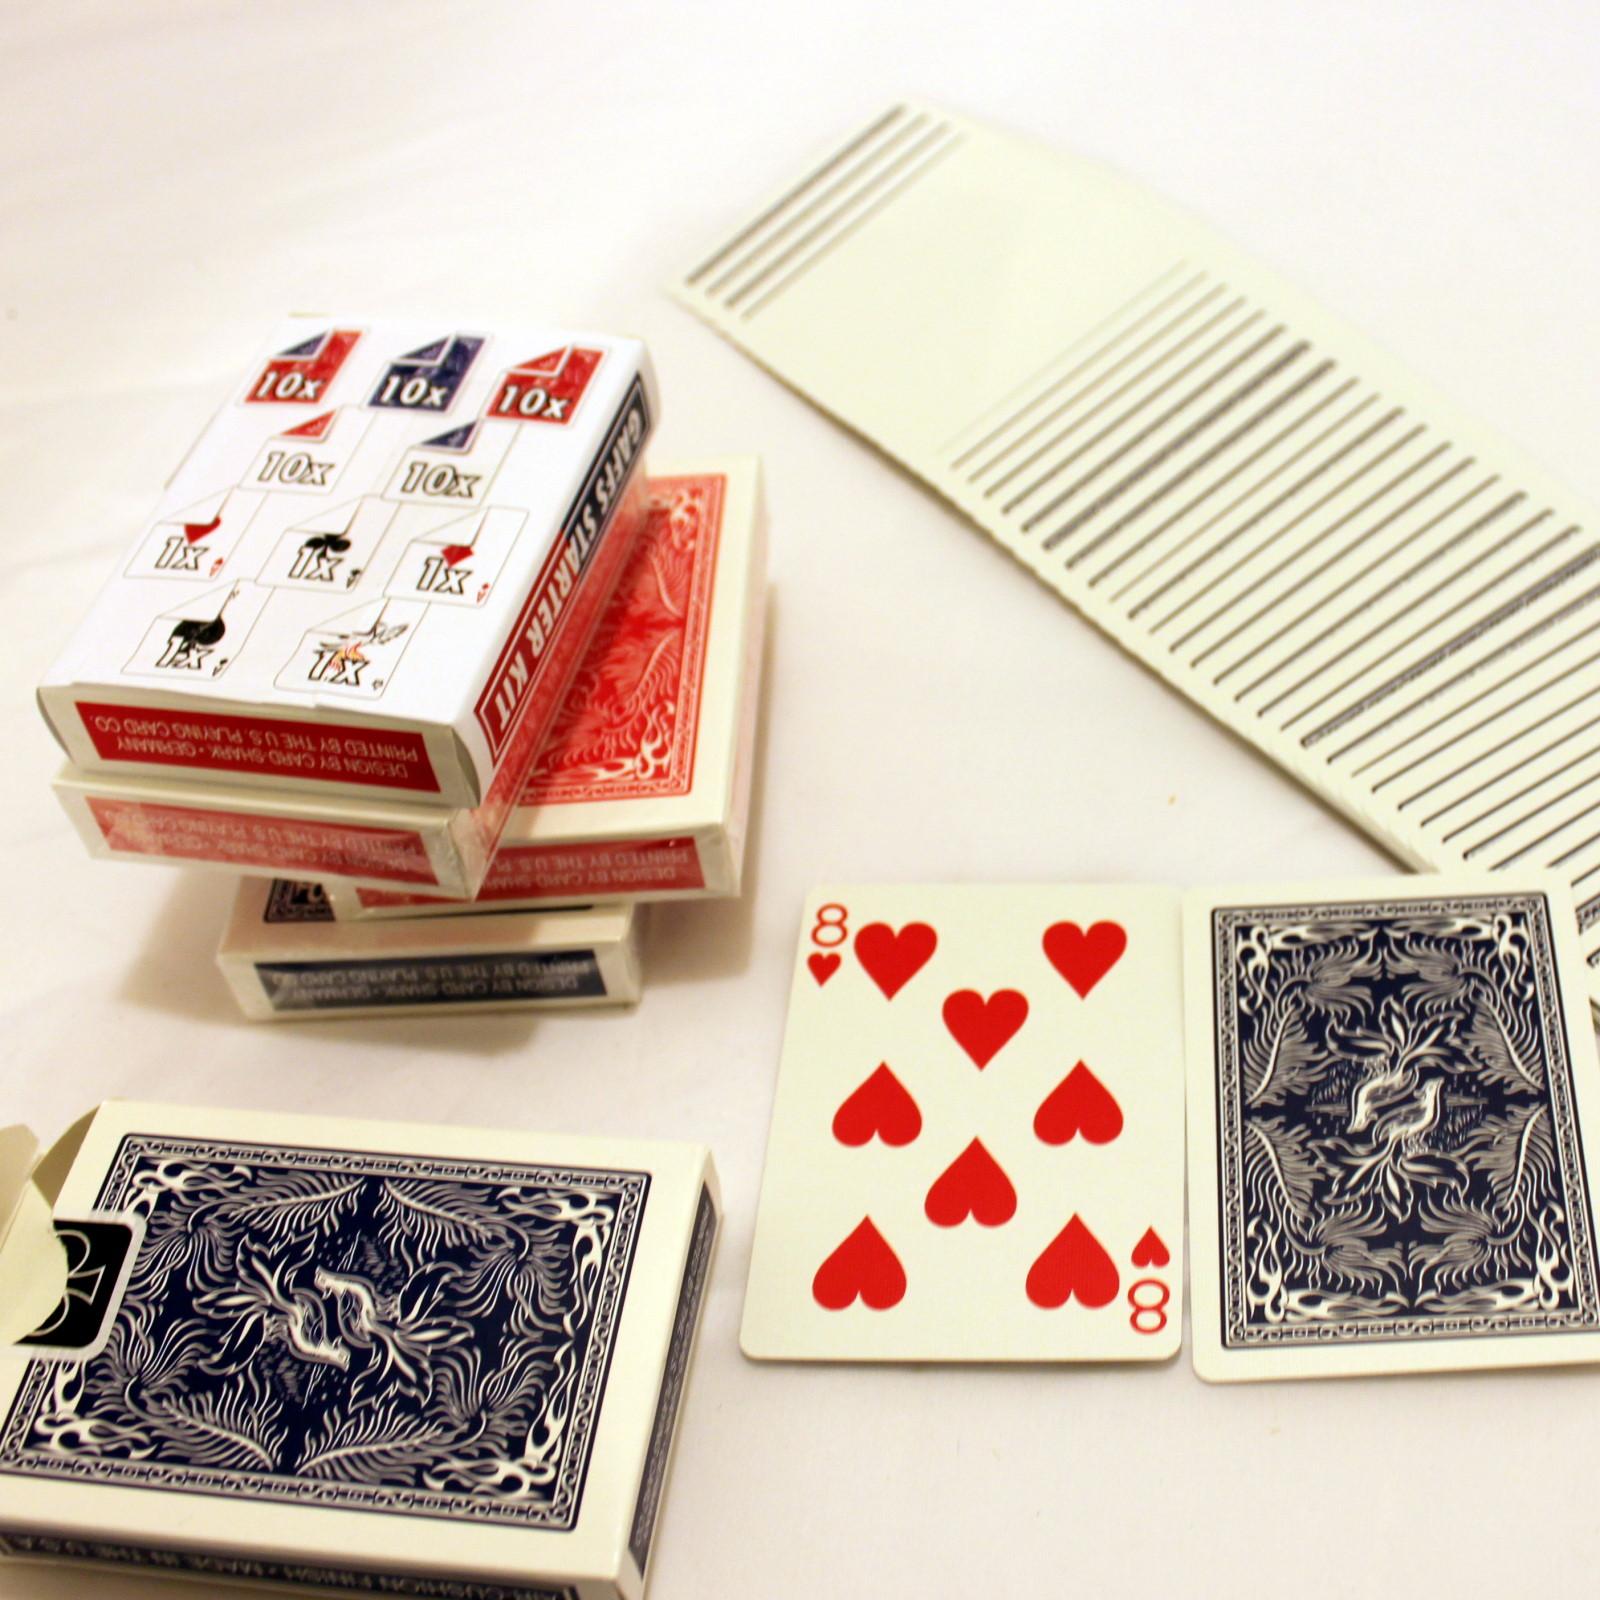 Card-Shark - Phoenix Deck Collection by Card-Shark